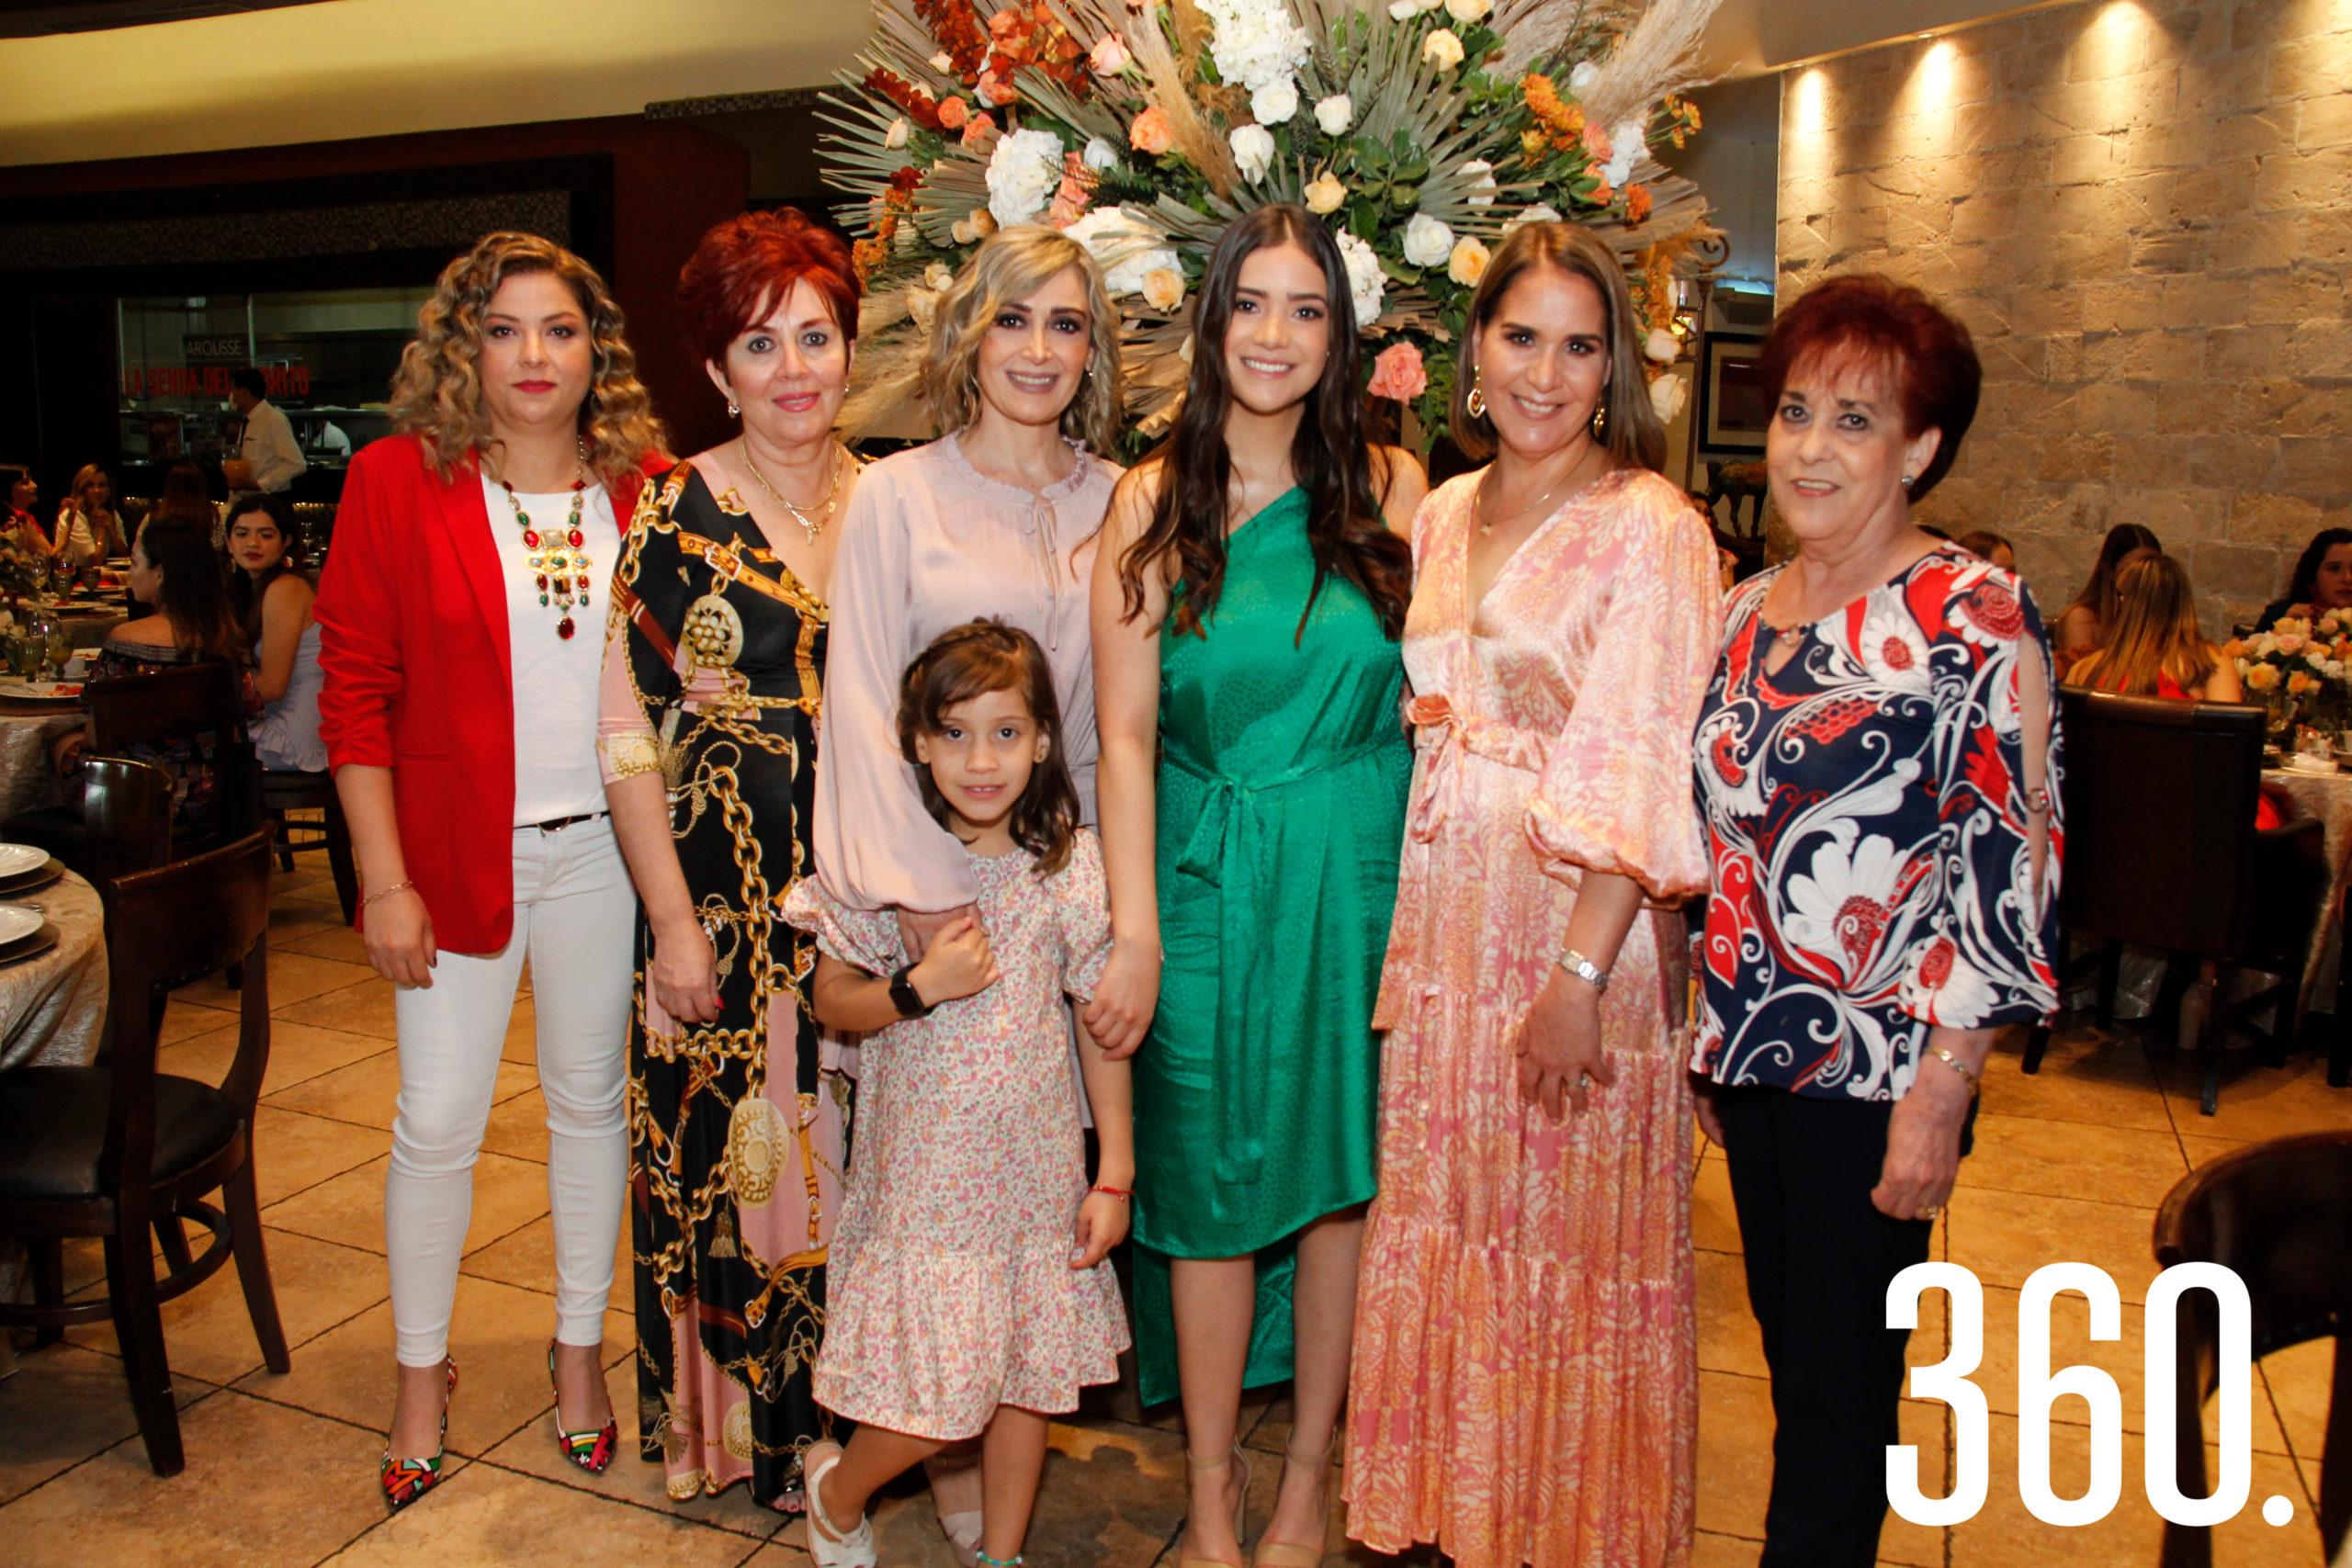 Mariané Abundis, Guillermina Sandoval, Nona Abundis, Natalia Hernández, Sofía Chávez, Teté Gómez y Martha Abundis.